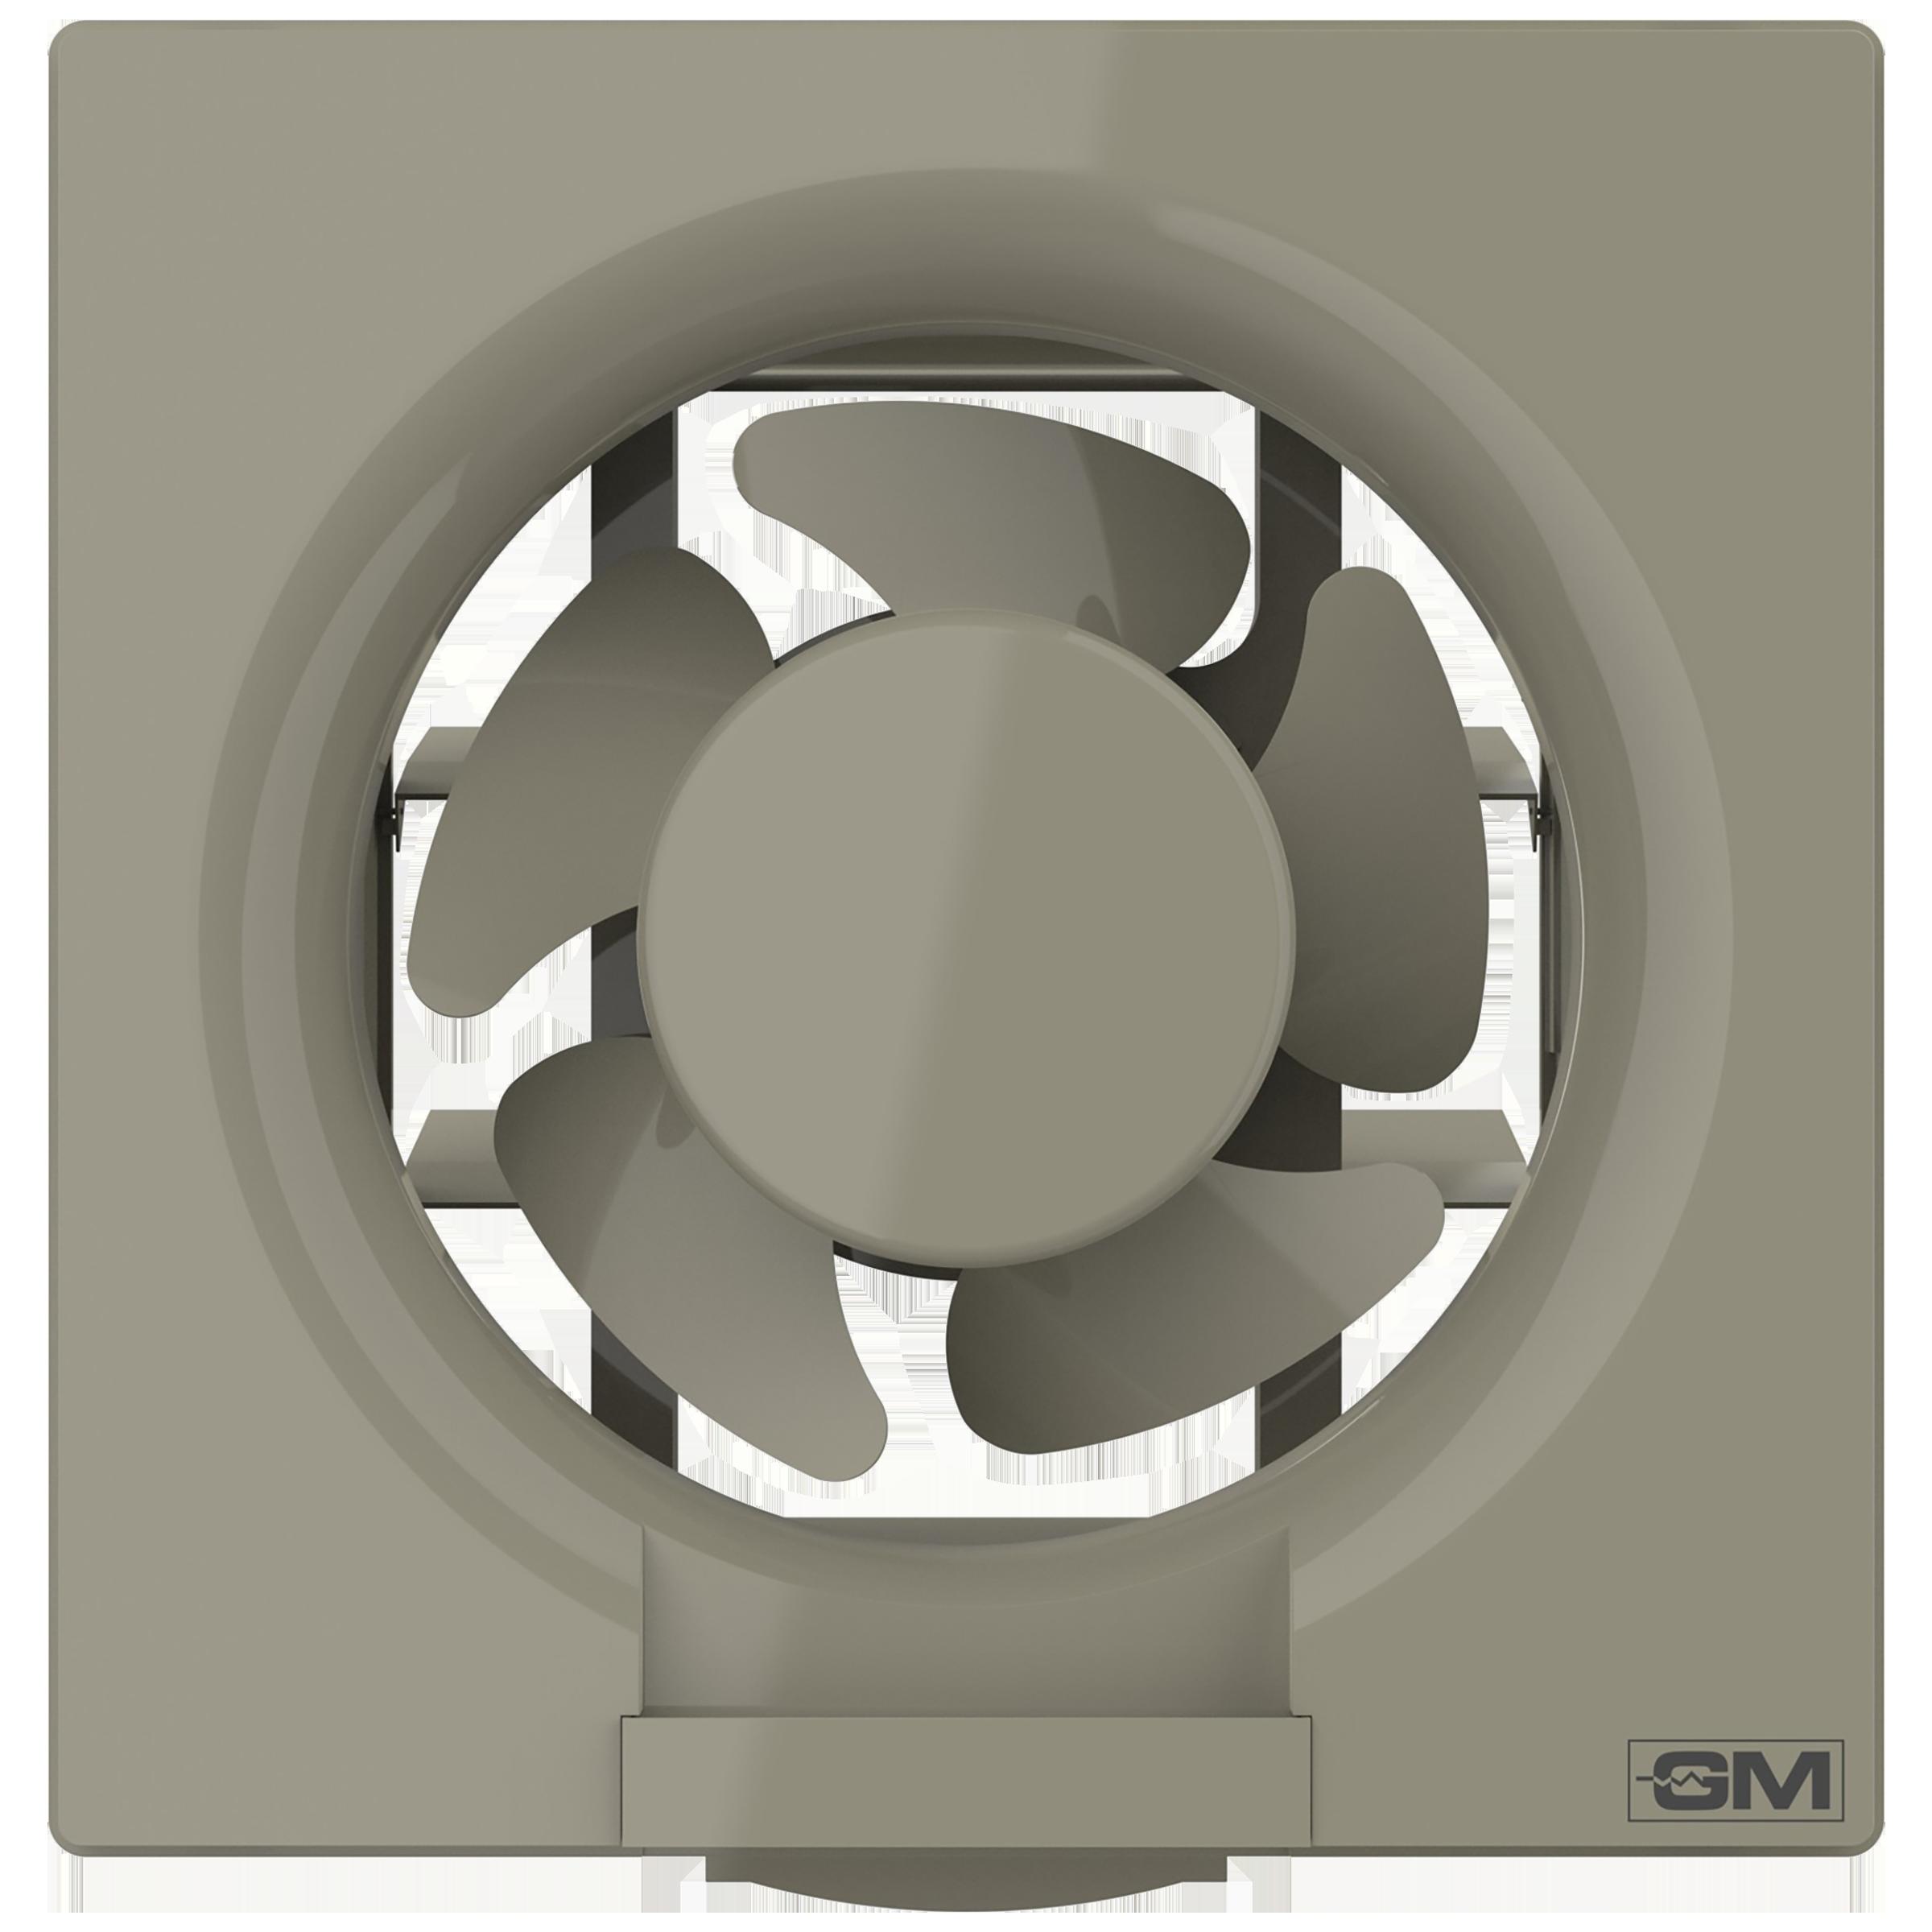 GM Eco Air 25 cm Sweep Exhaust Fan (Noiseless Fan, VFB100014IVGL, White)_1